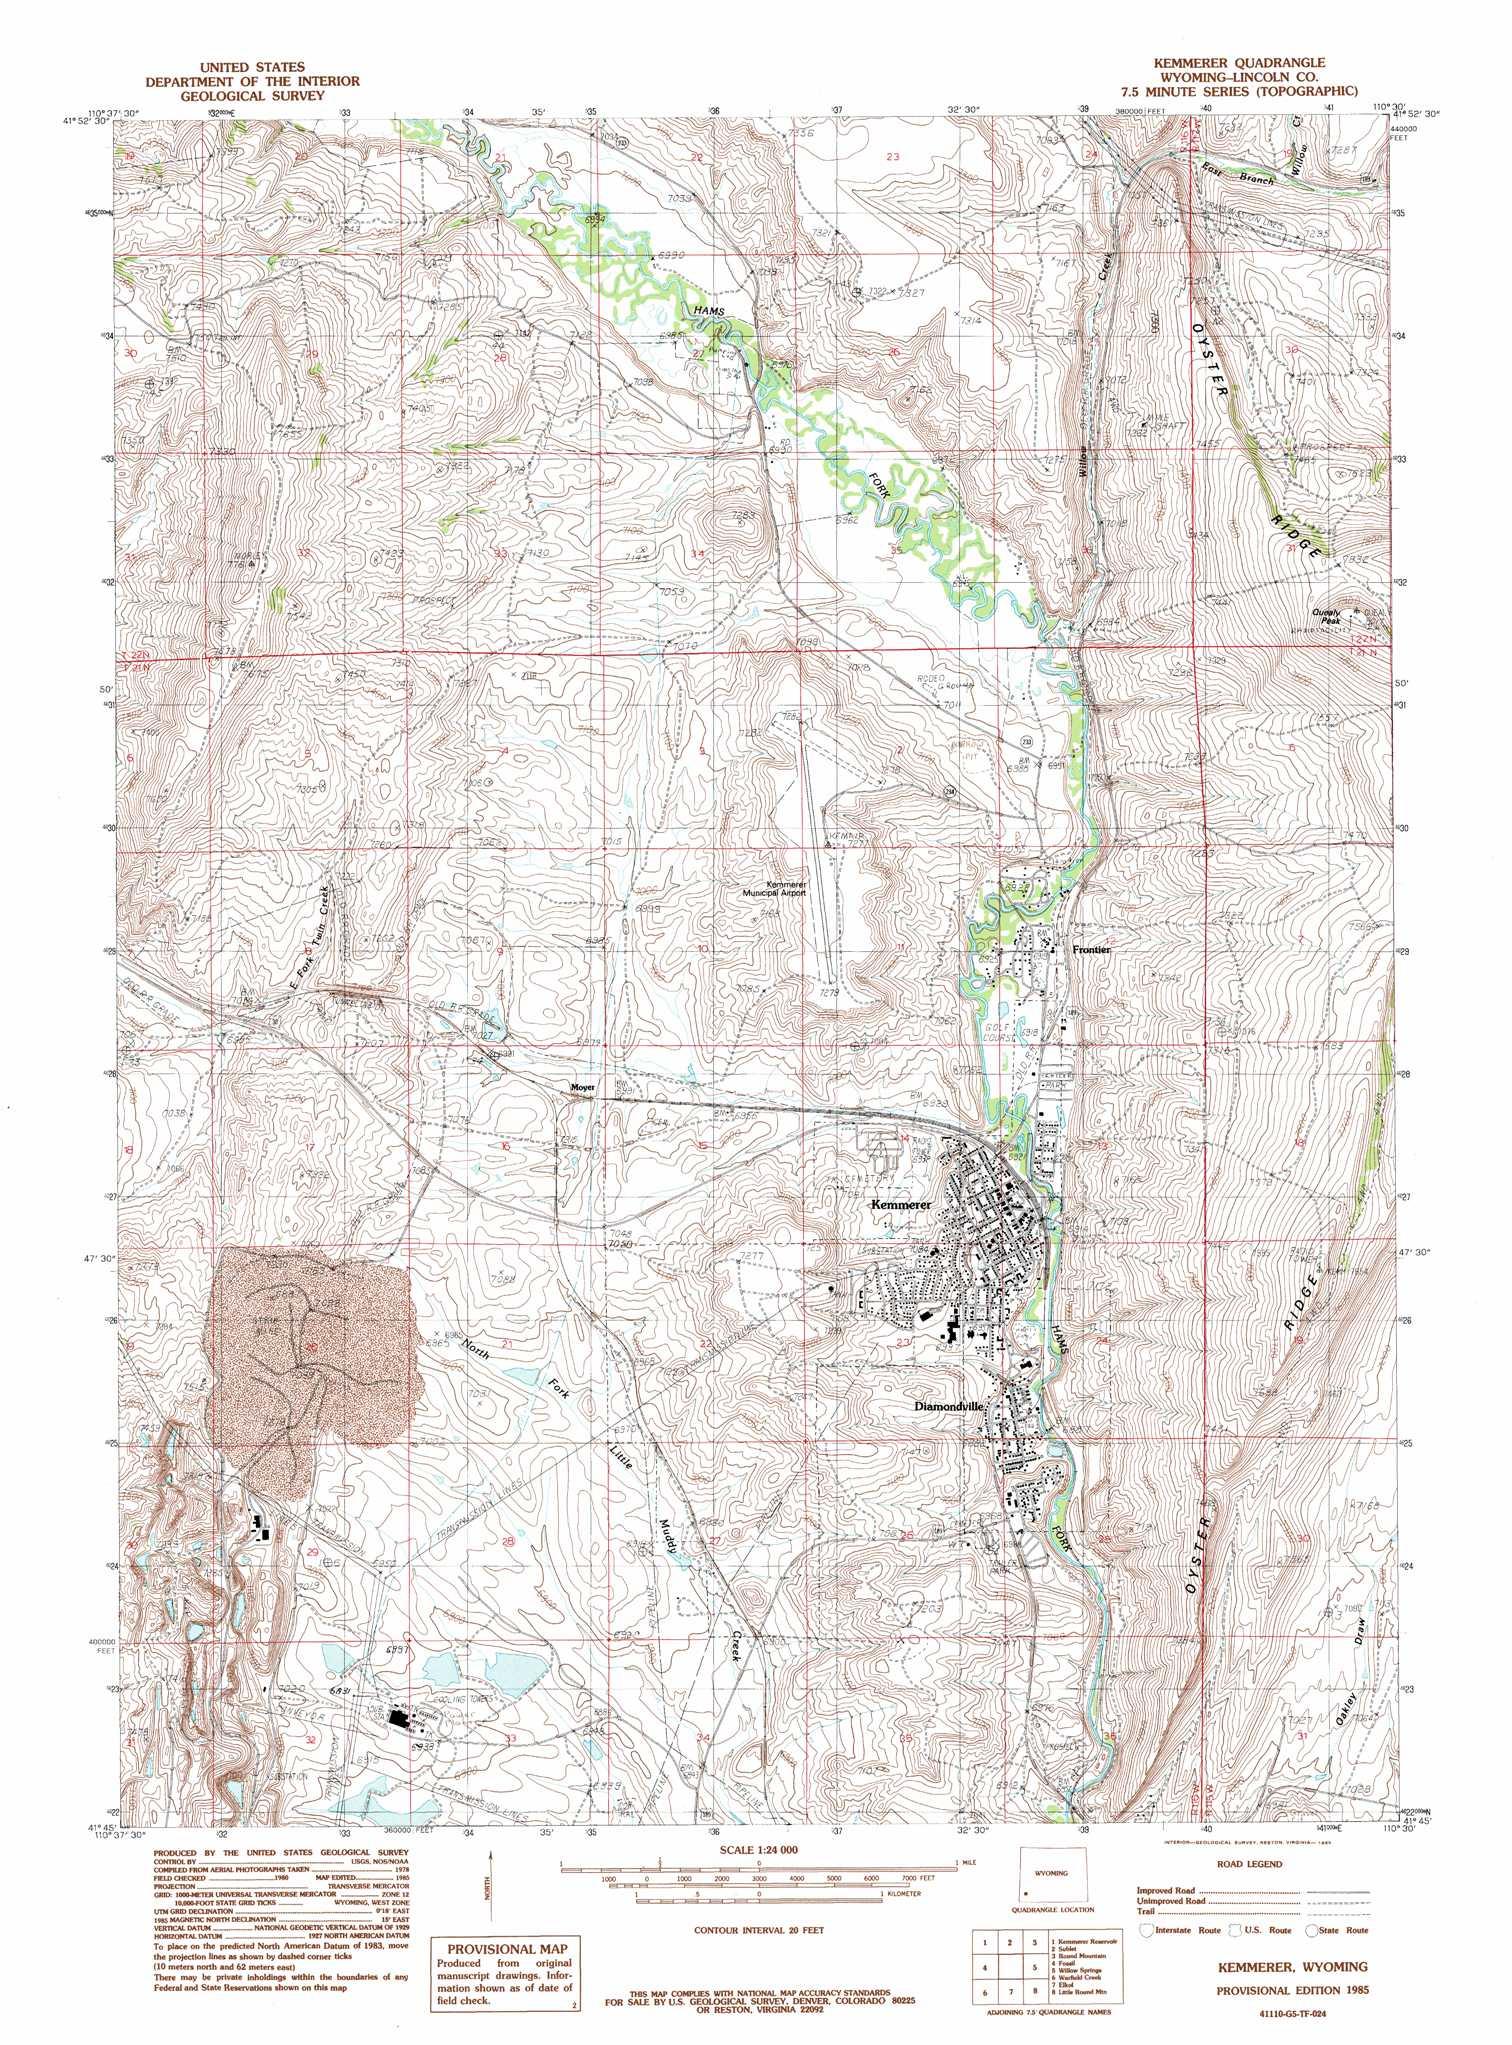 Kemmerer Topographic Map WY  USGS Topo Quad 41110g5